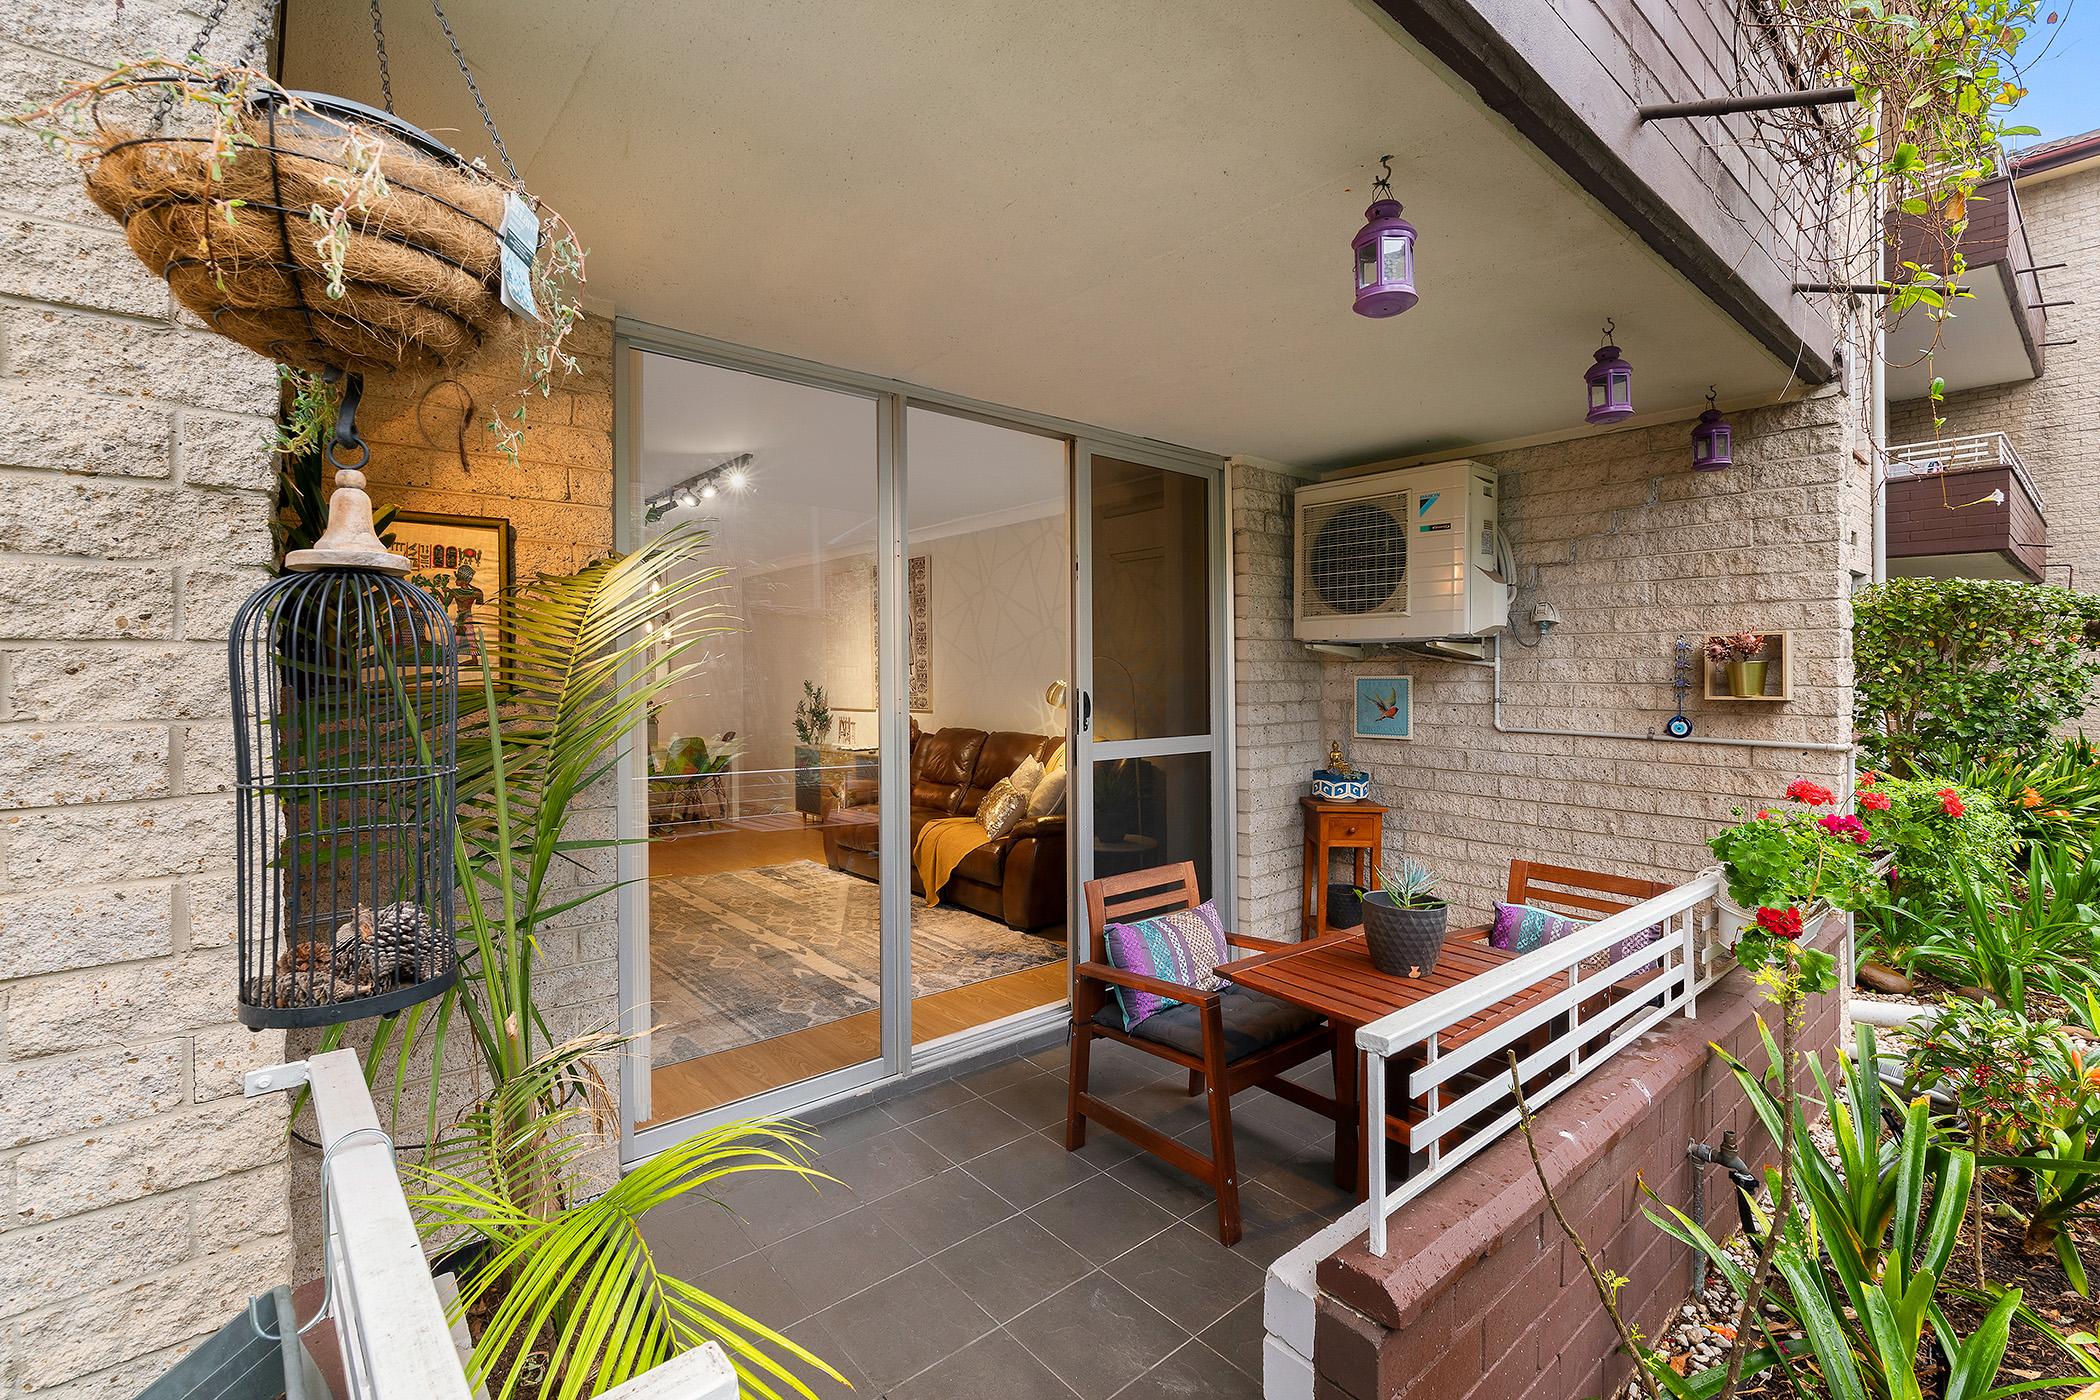 2/8 Buller Road, Artarmon, NSW 2064